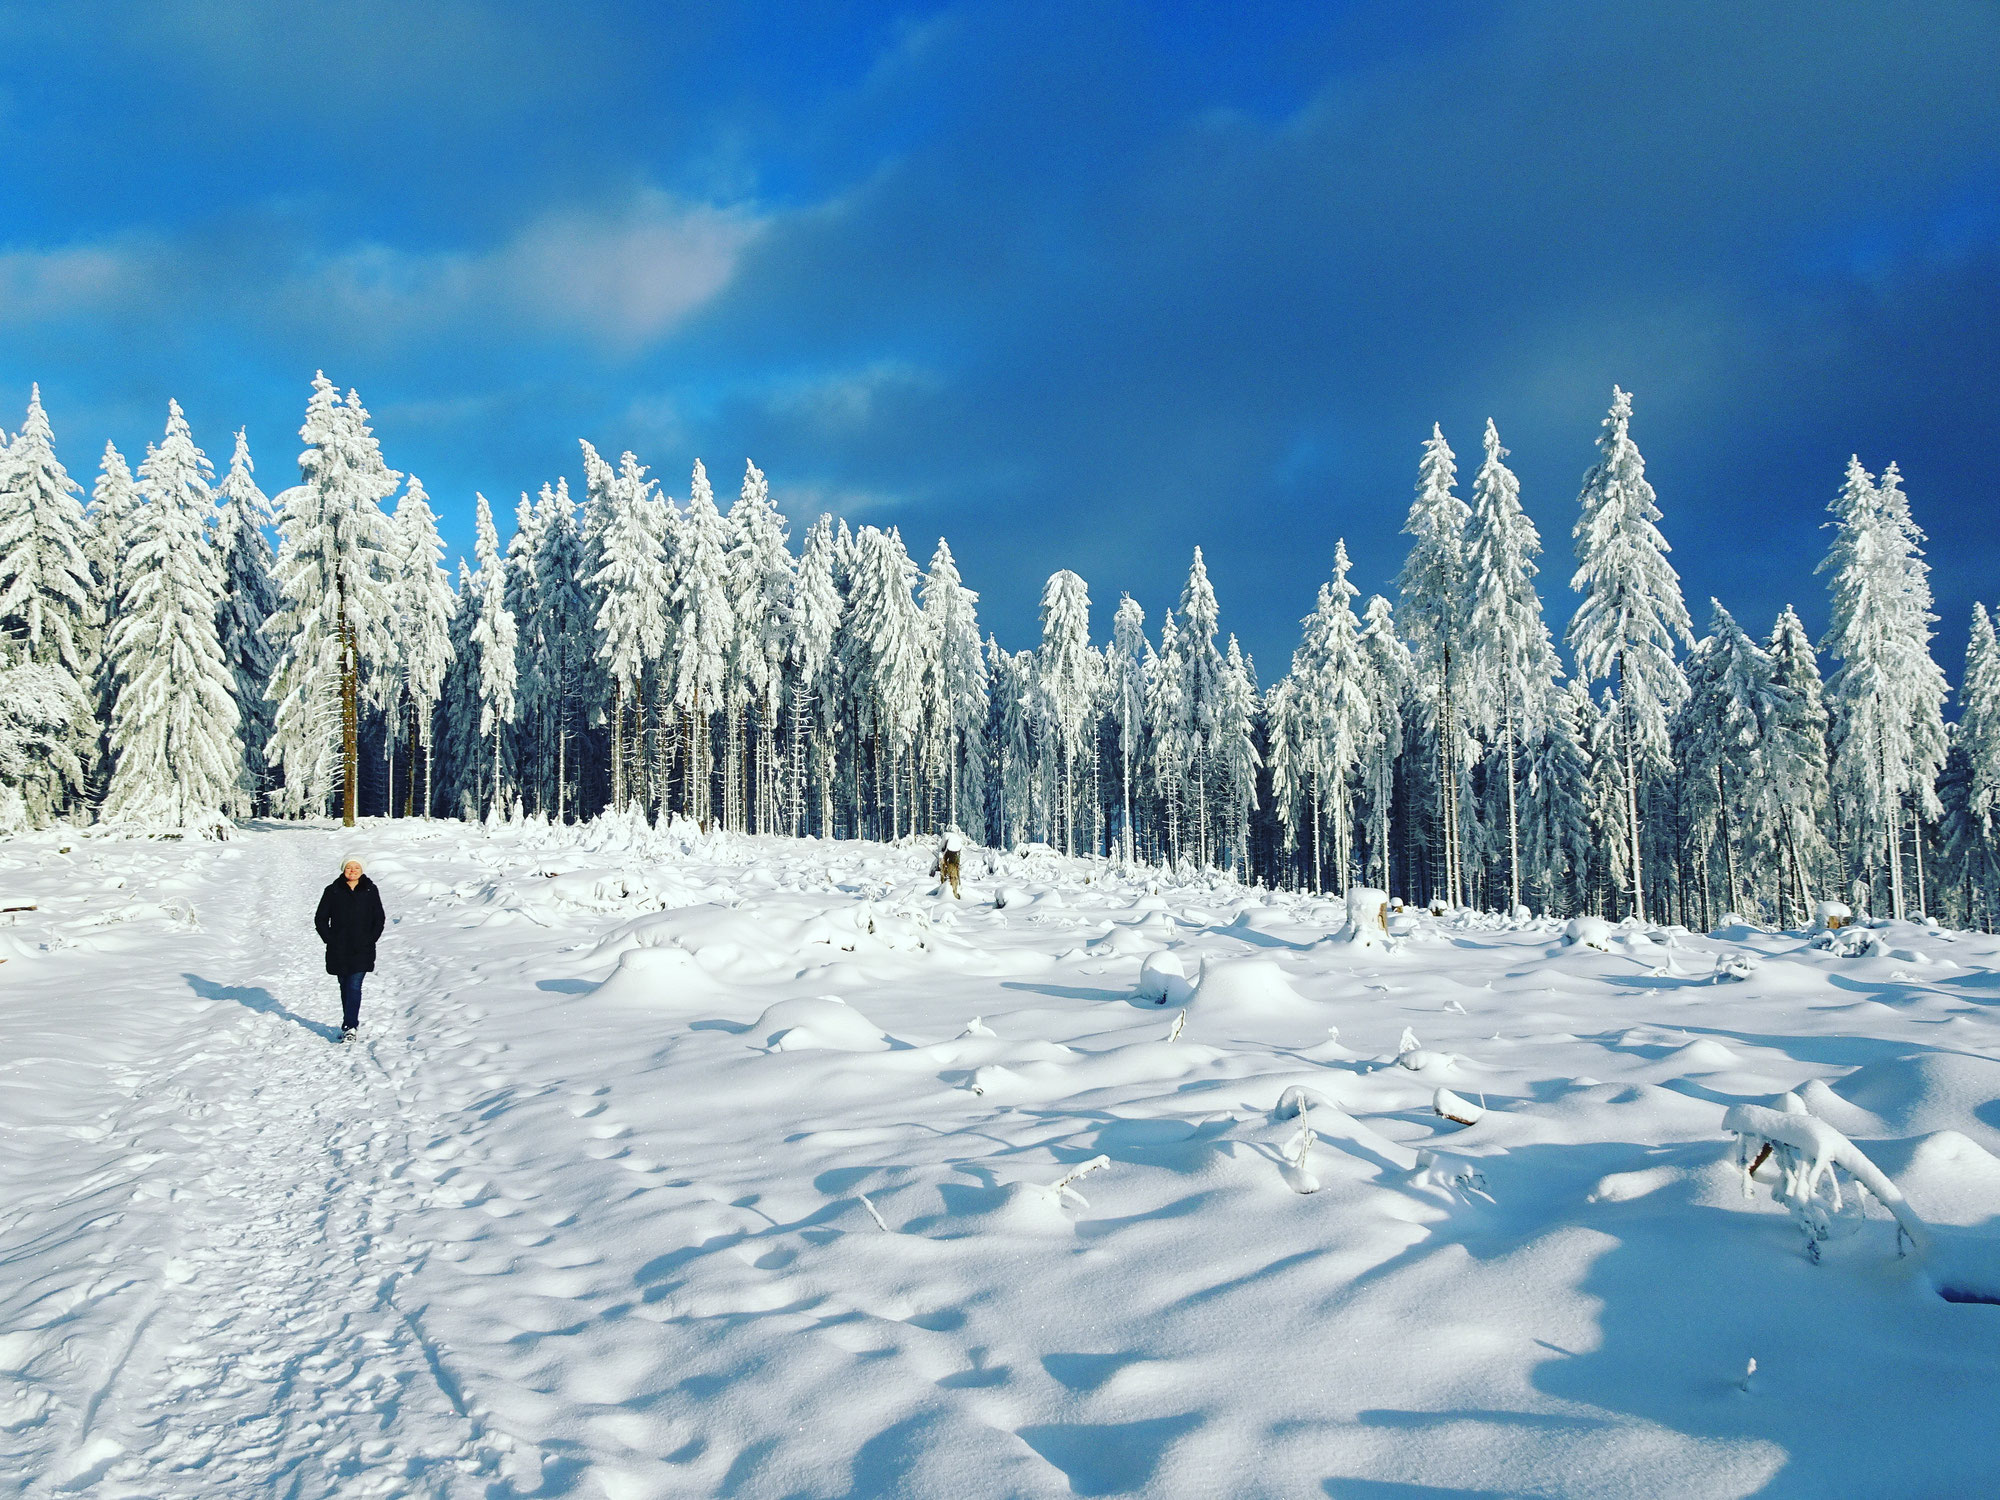 Rando dans la neige dans le Taunus